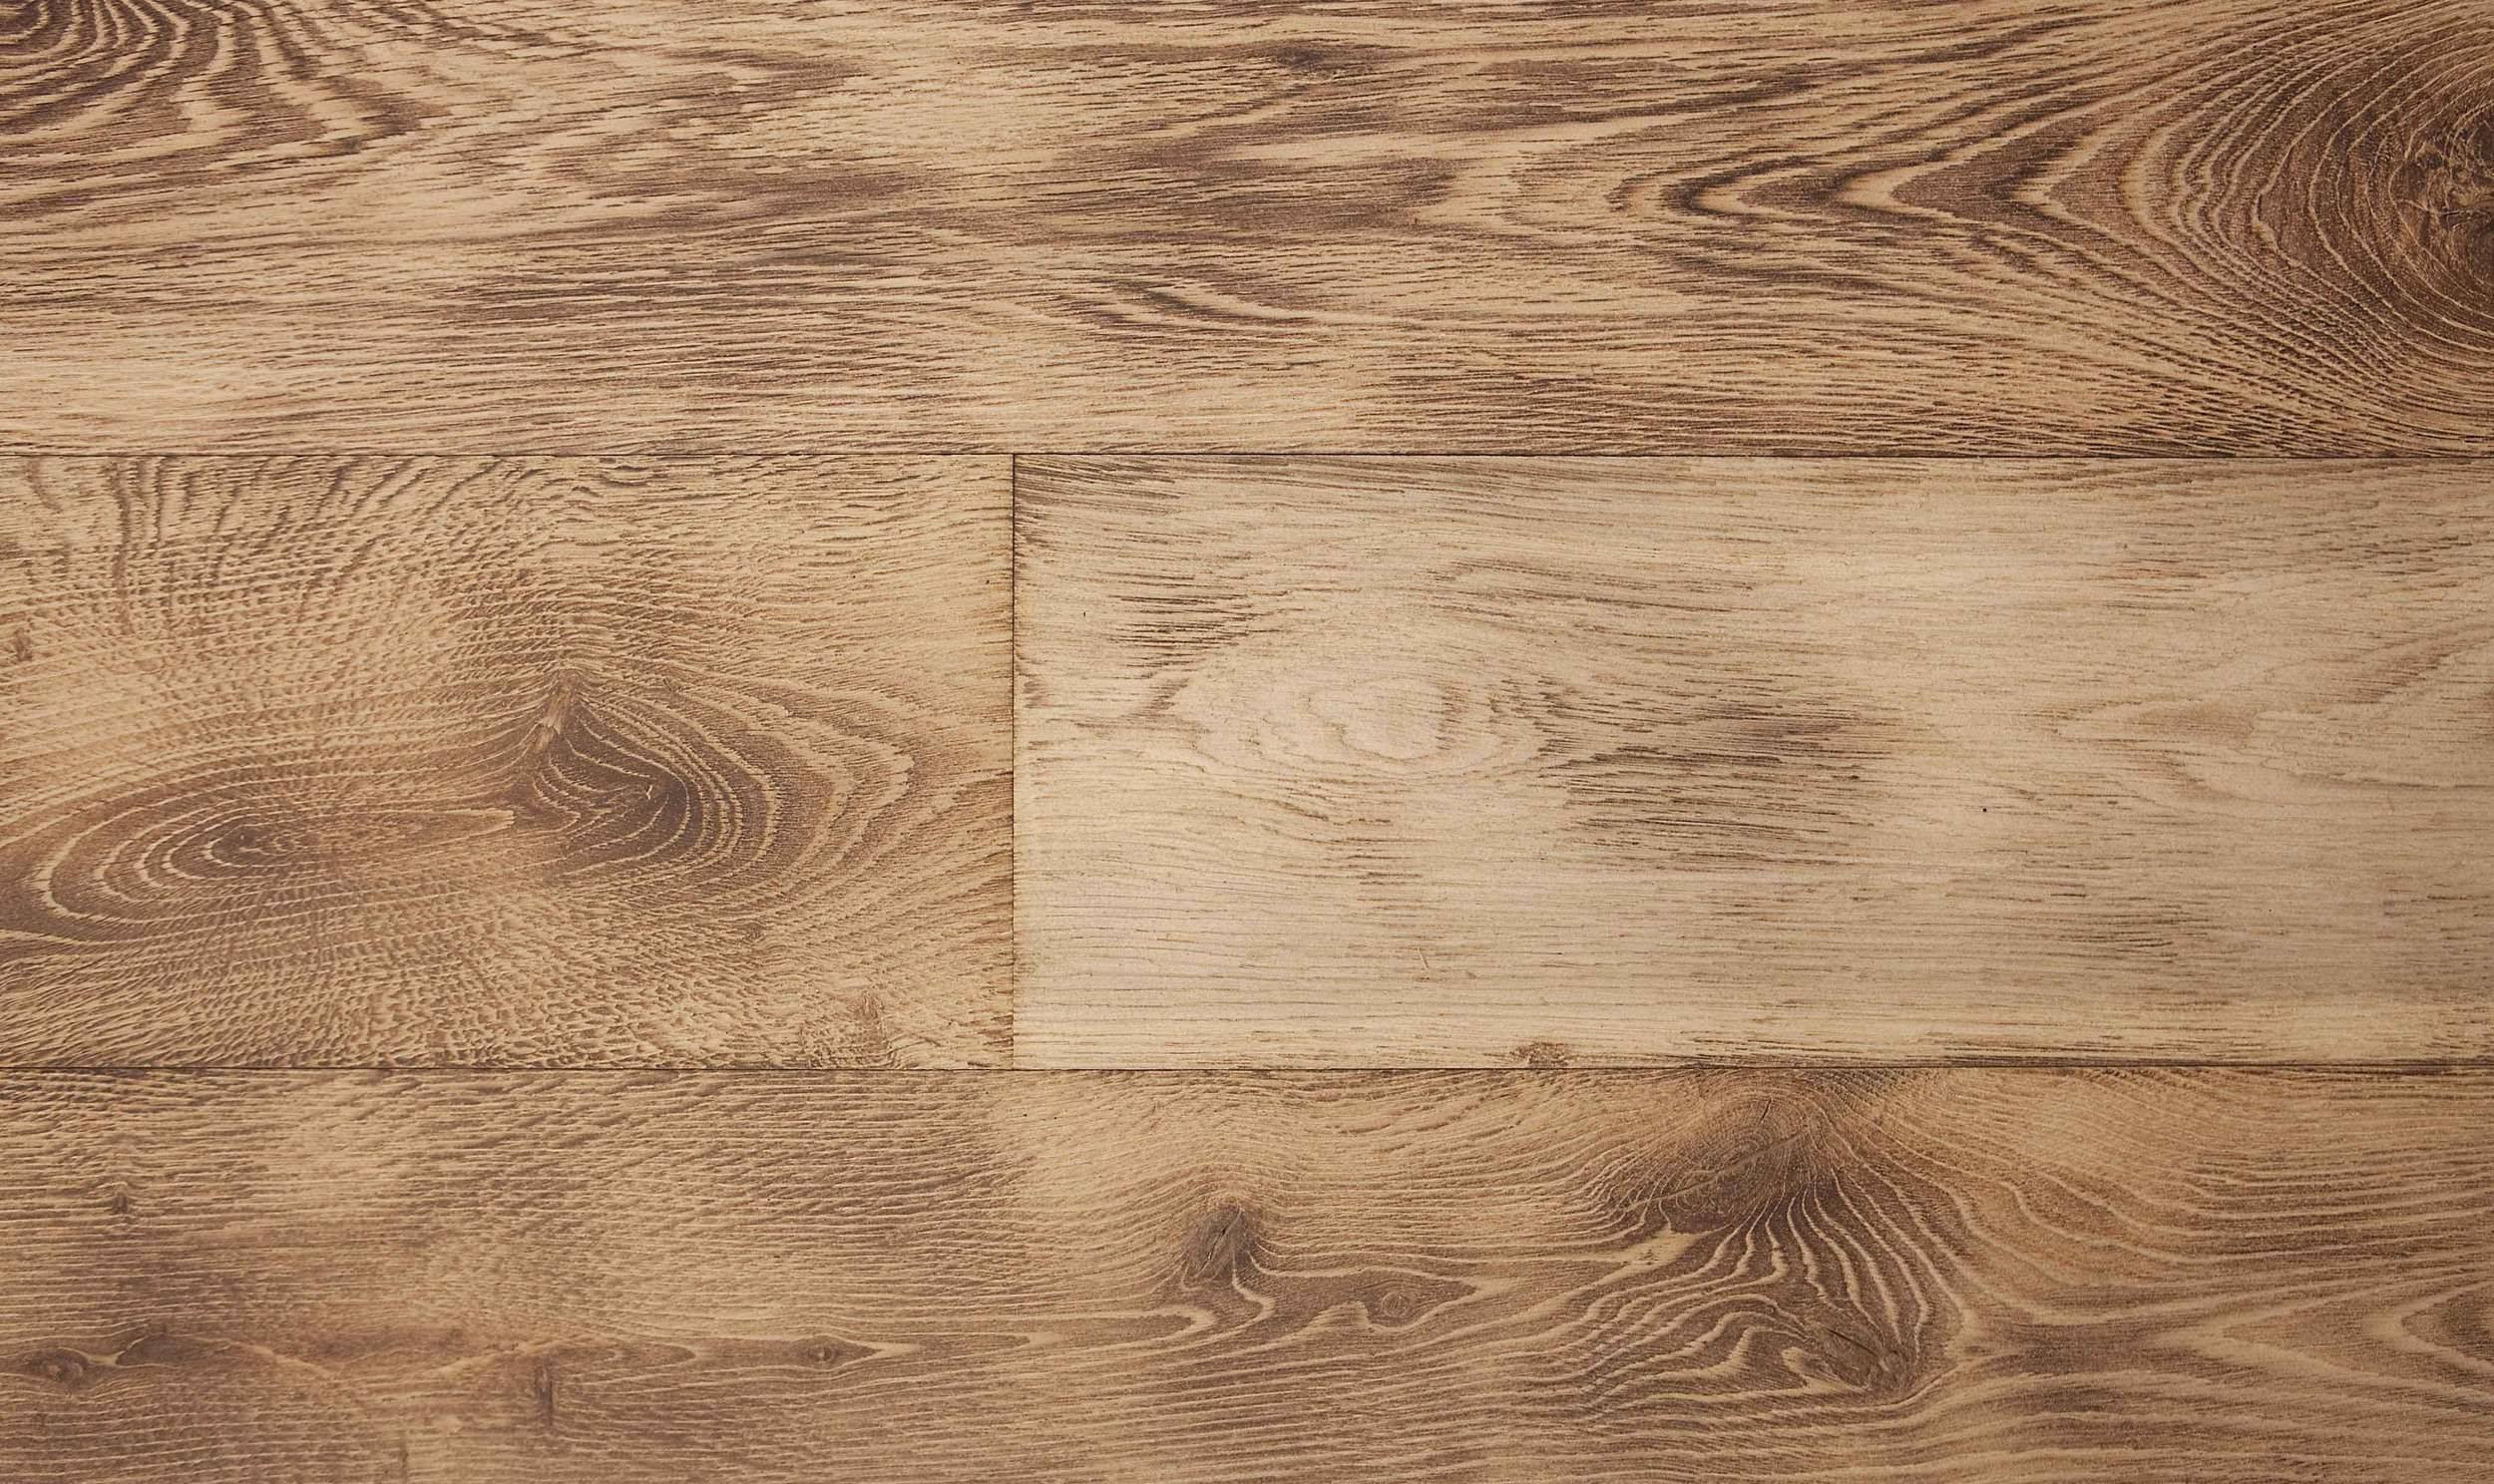 discount hardwood flooring nashville tn of results for discount hardwood flooring los angeles throughout discount hardwood flooring los angeles awesome of artisan collection fame hardwood los angeles